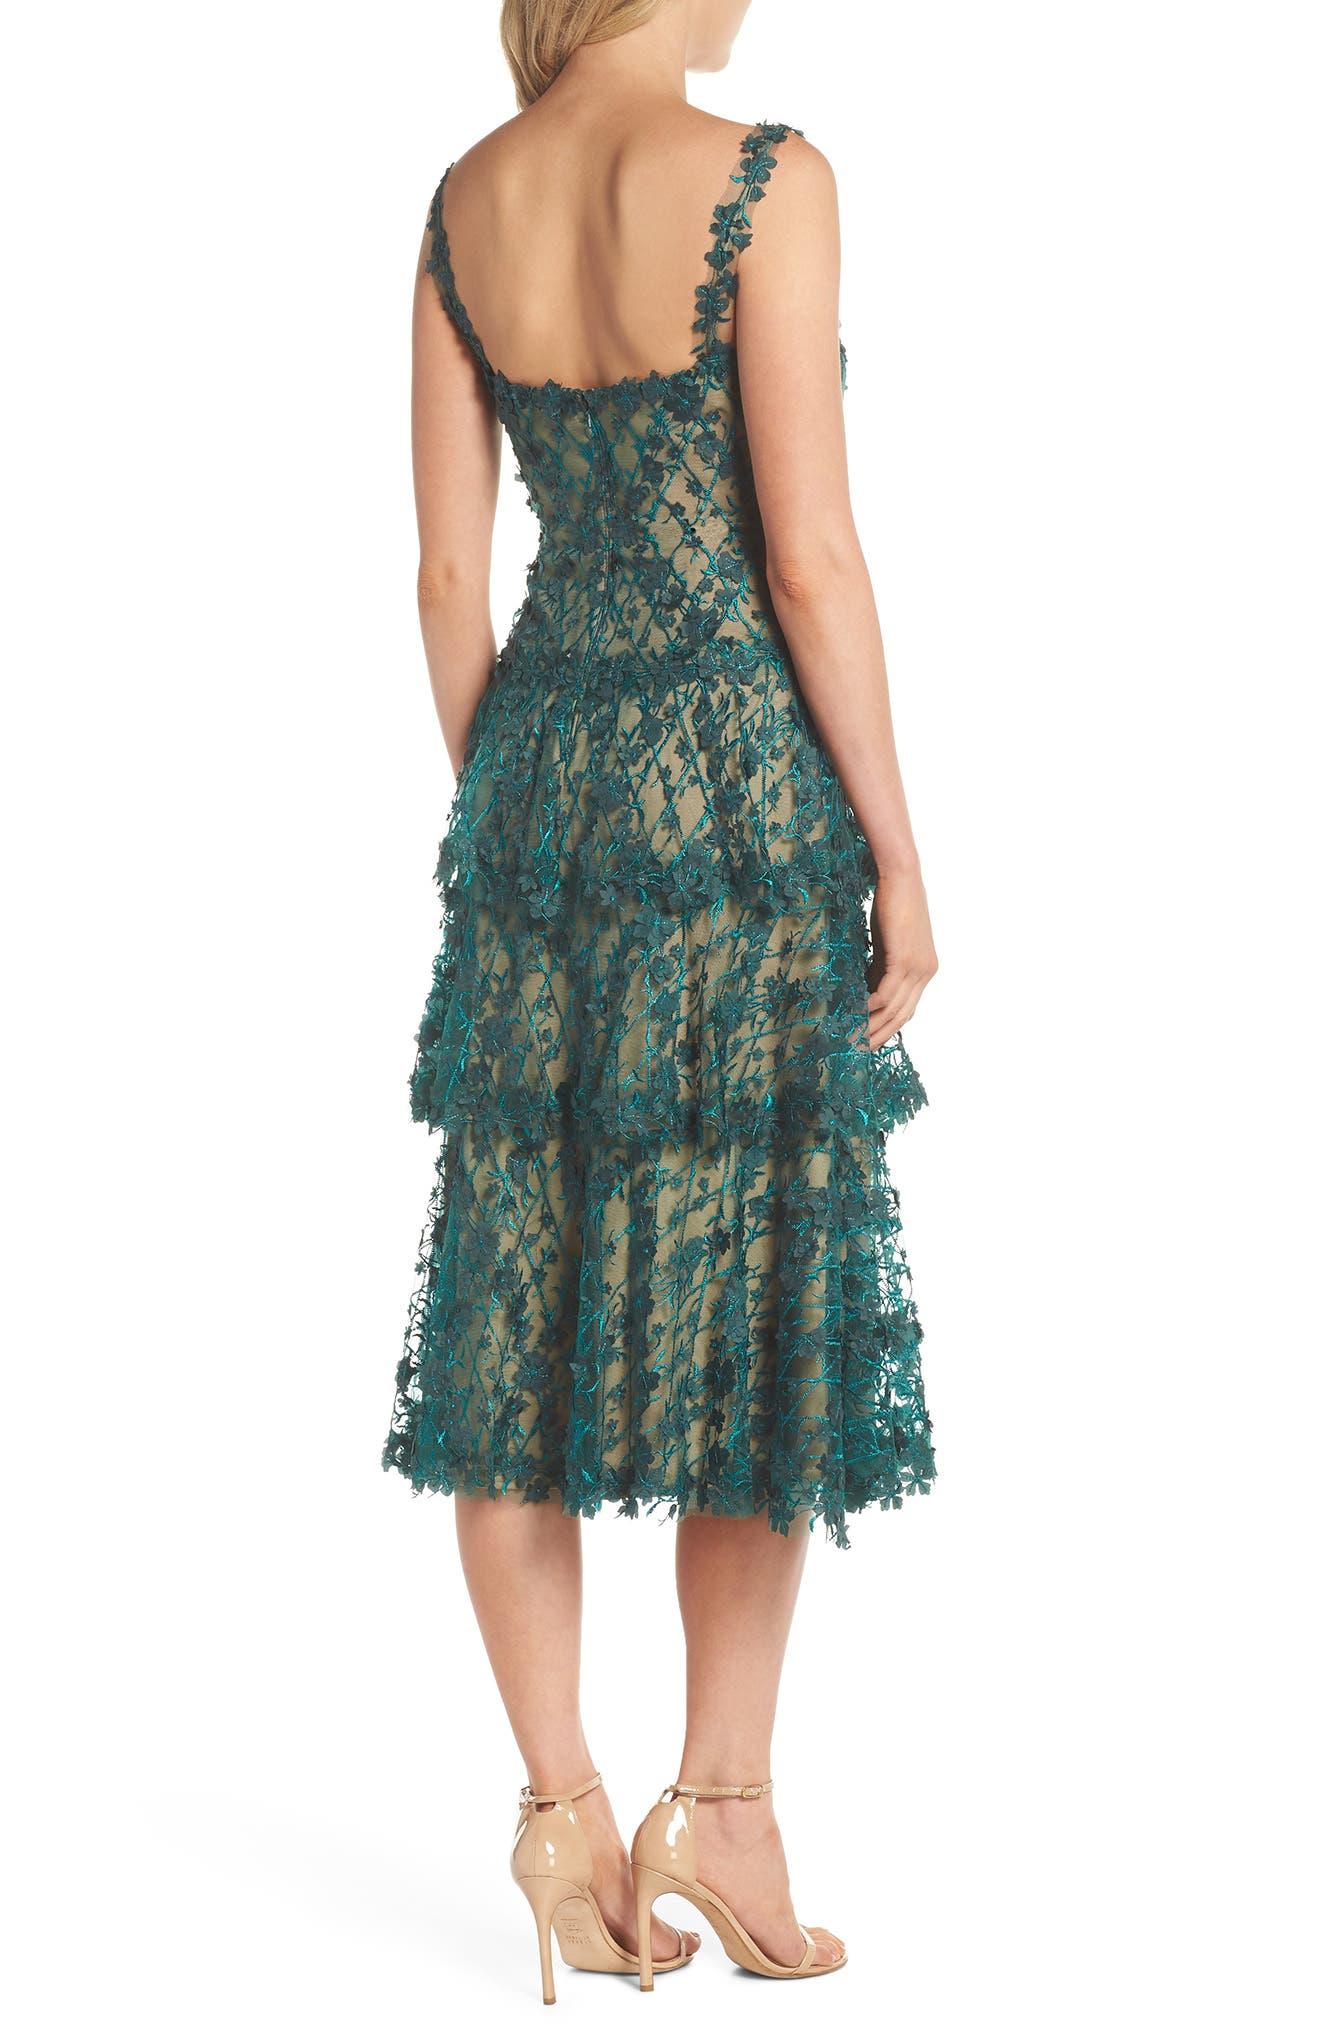 3D Floral Midi Dress,                             Alternate thumbnail 2, color,                             PINE/ NUDE